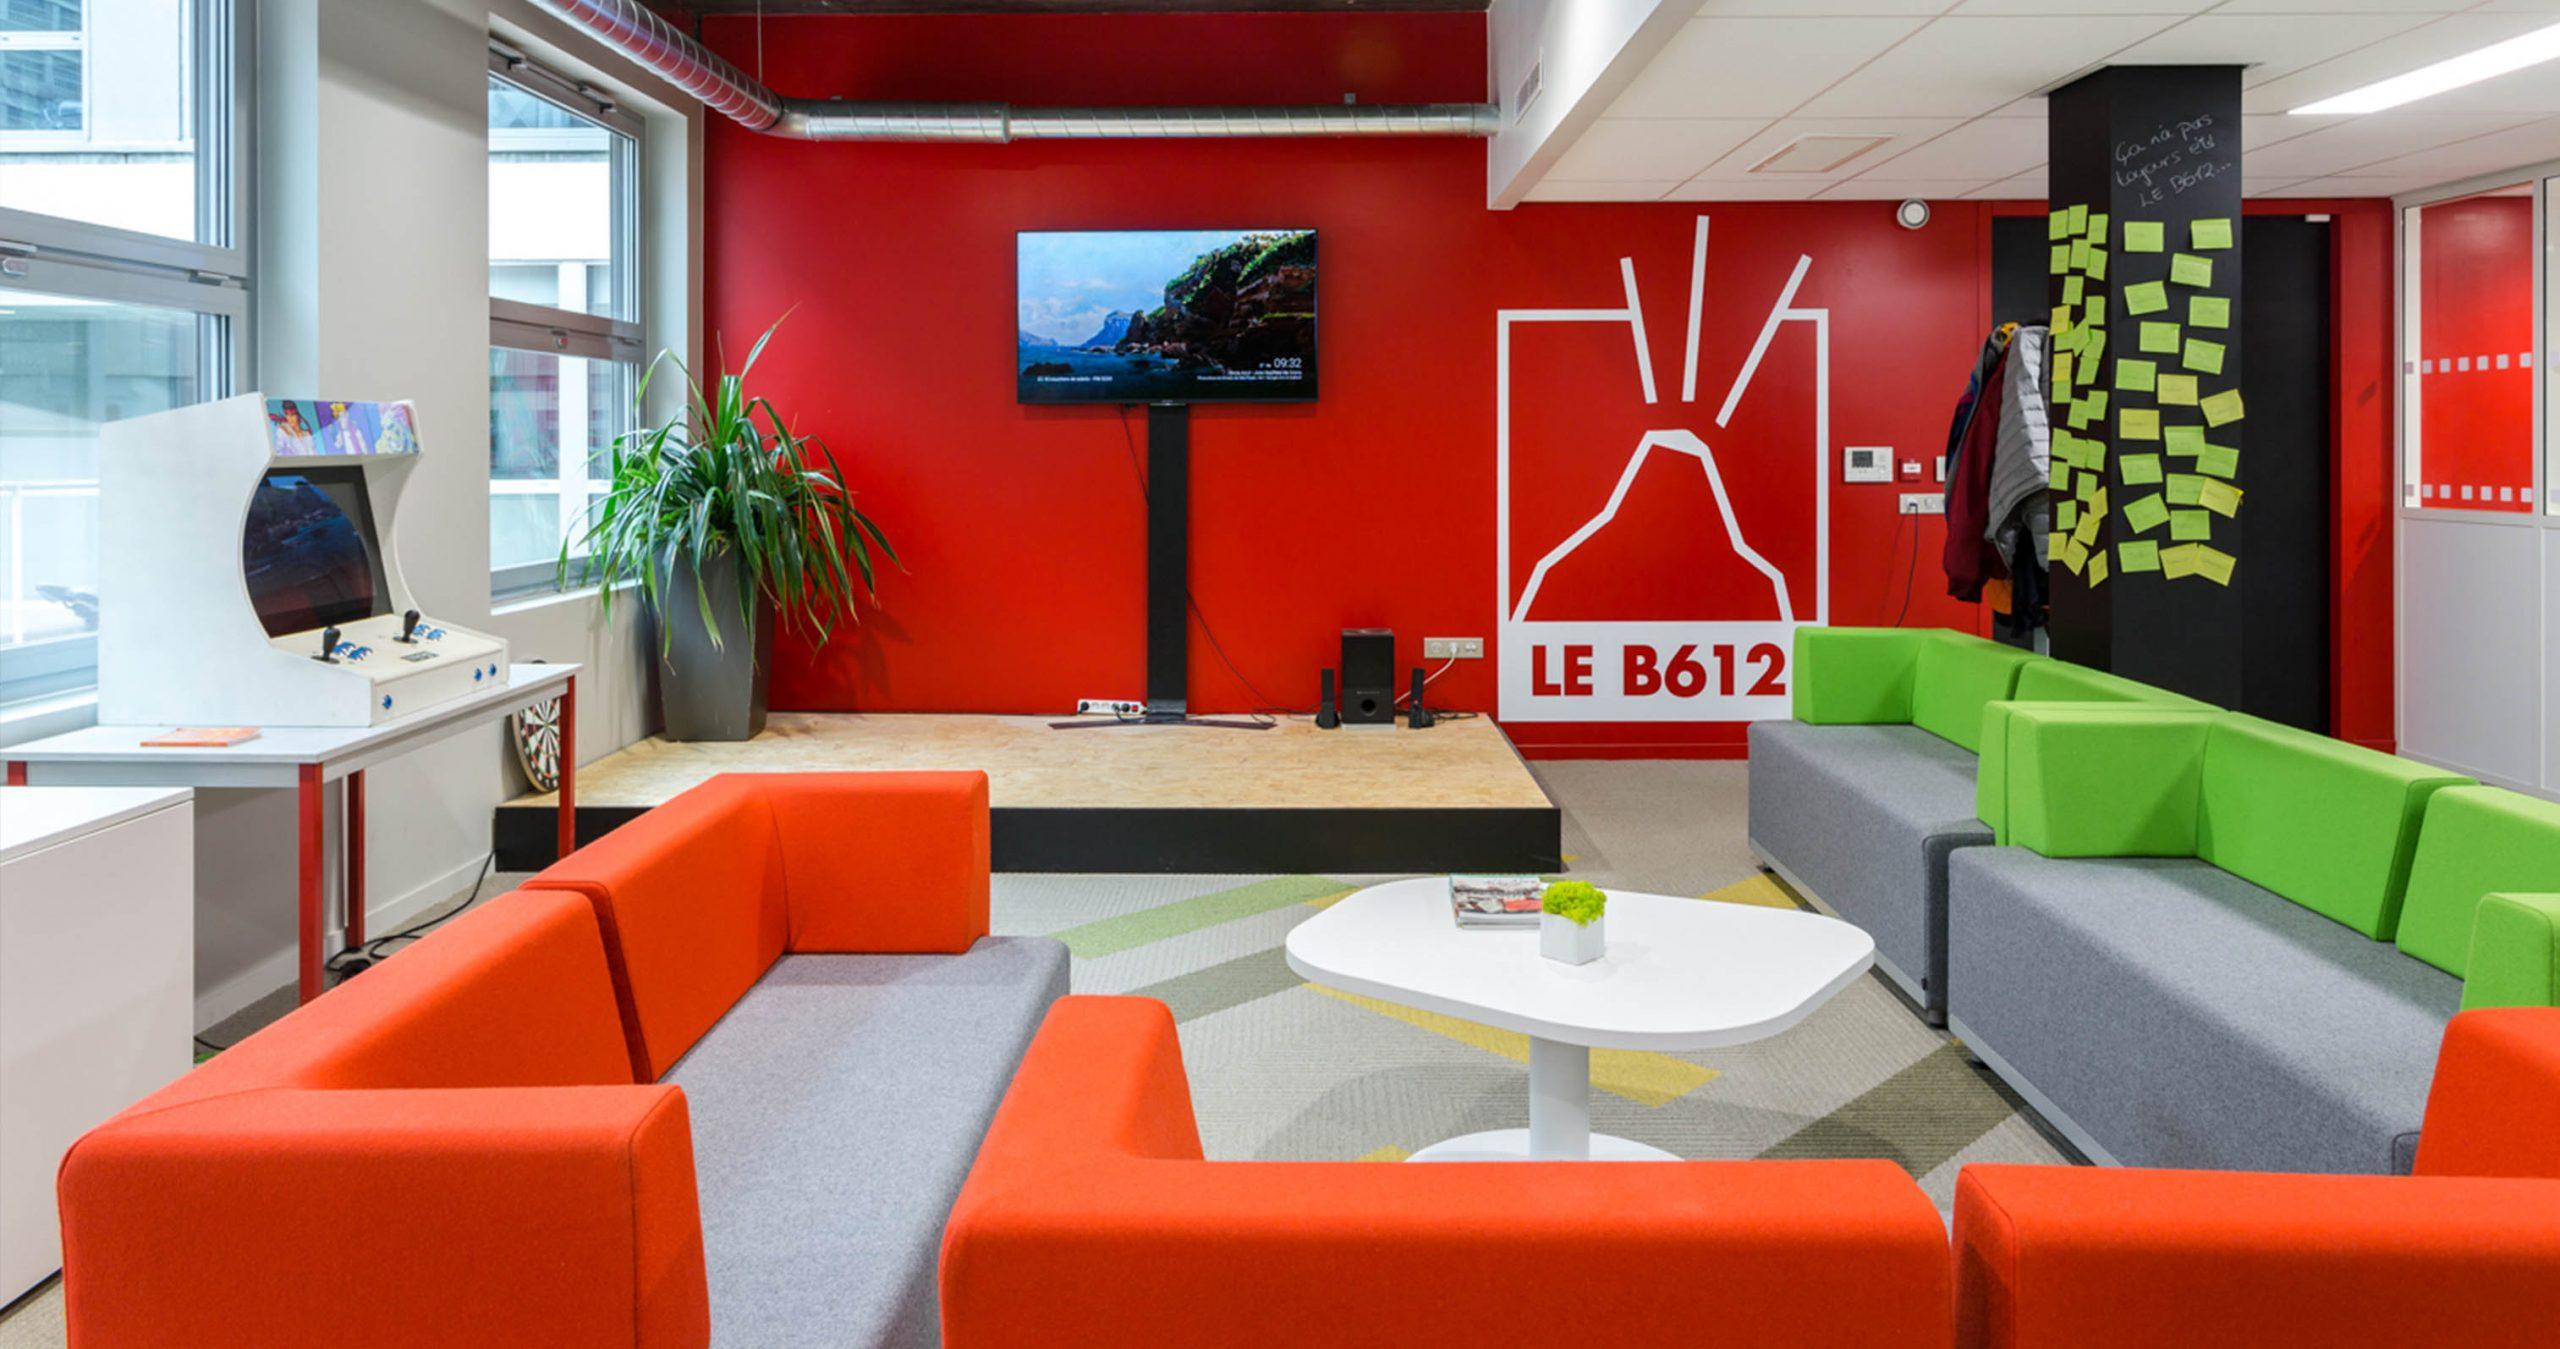 l'incubateur B612 Lyon